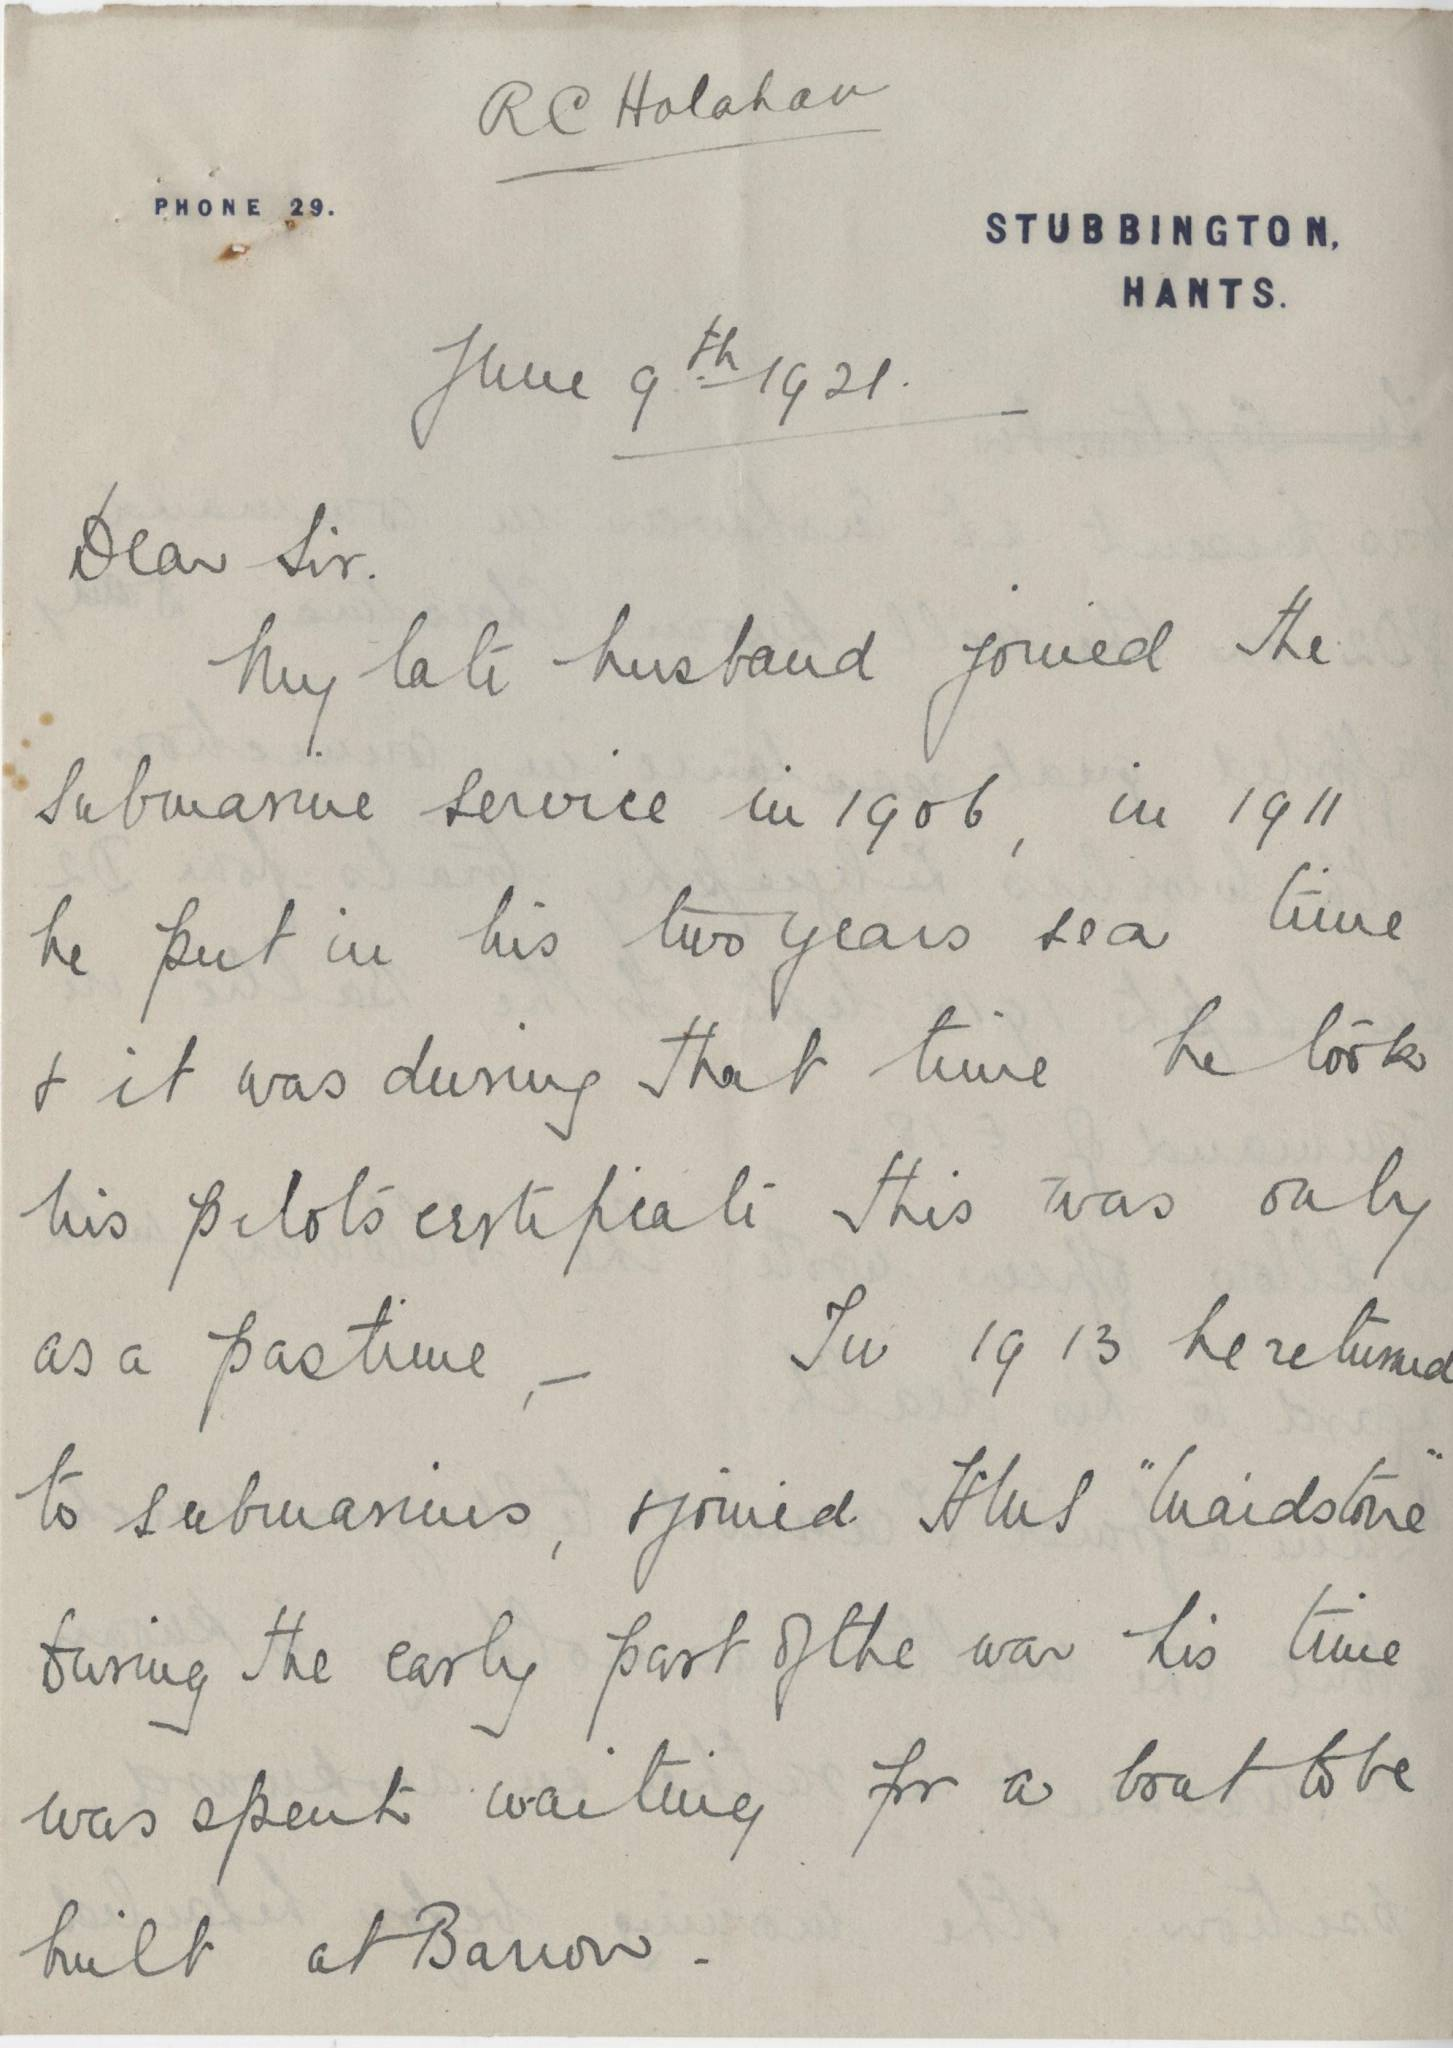 Halahan RC Widow Letter 1